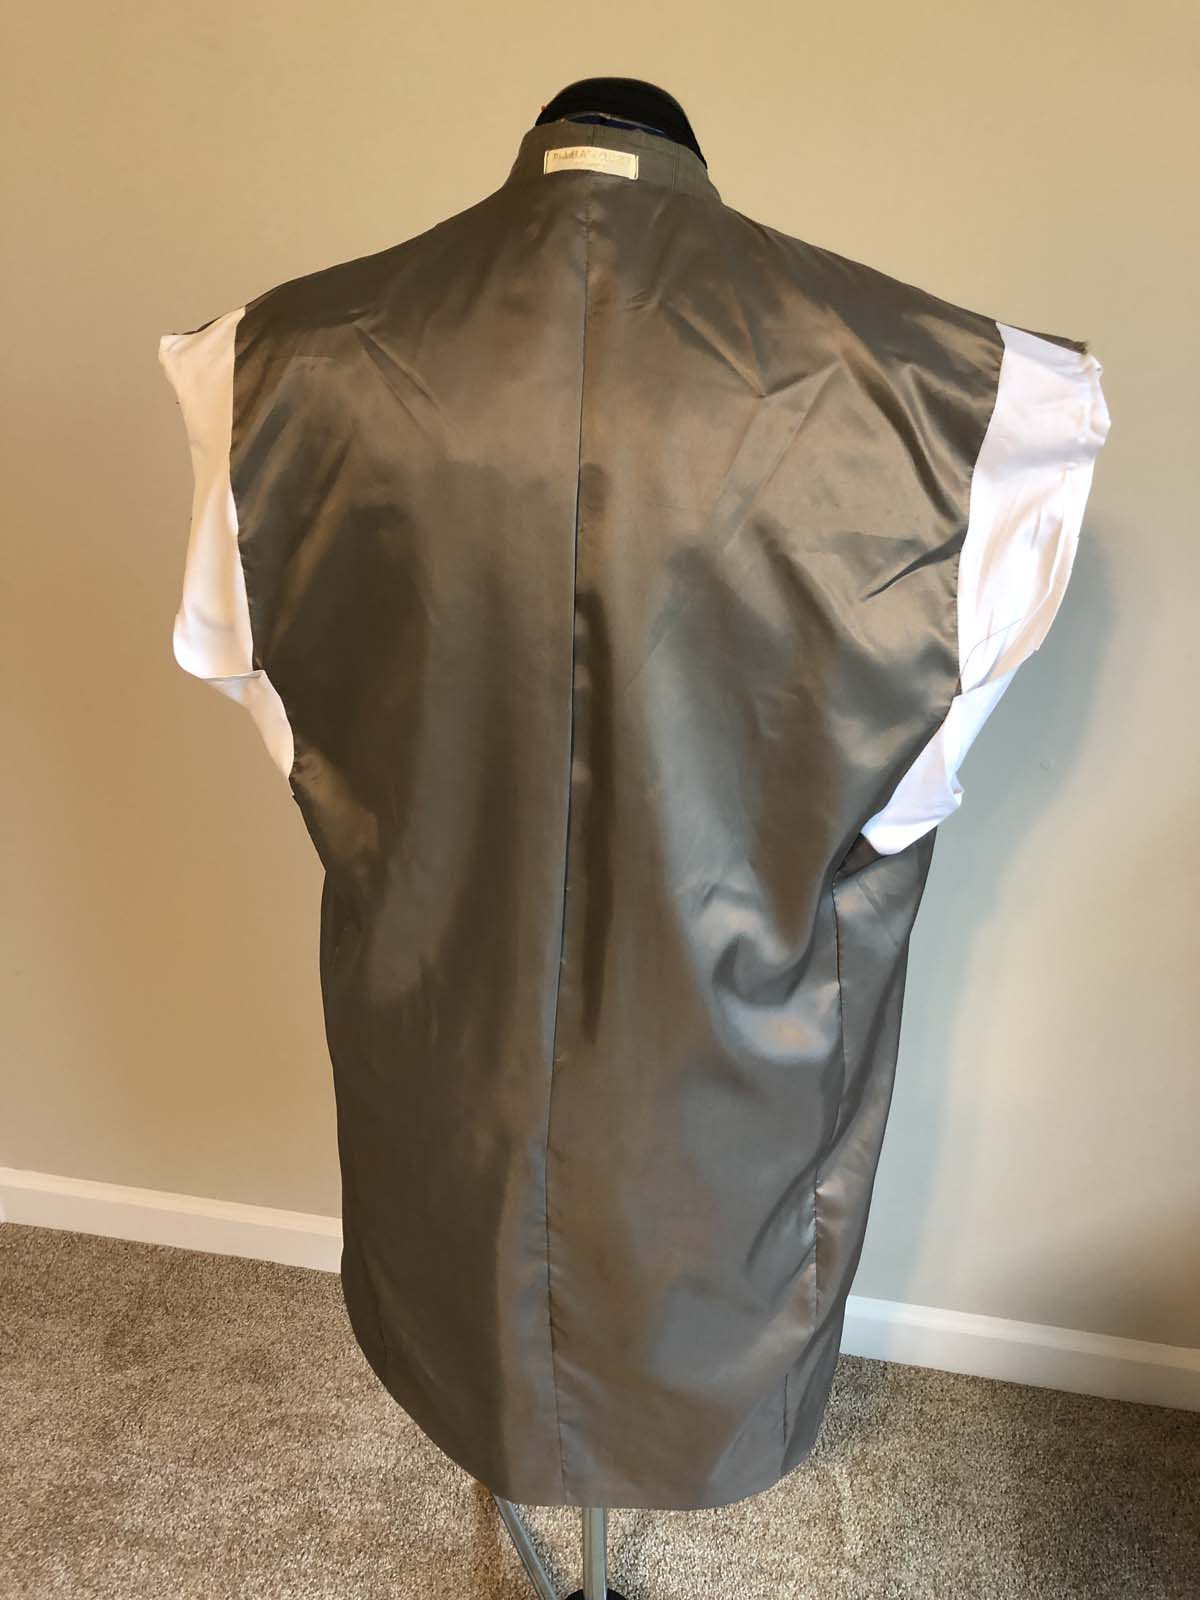 adjusted suit jacket lining